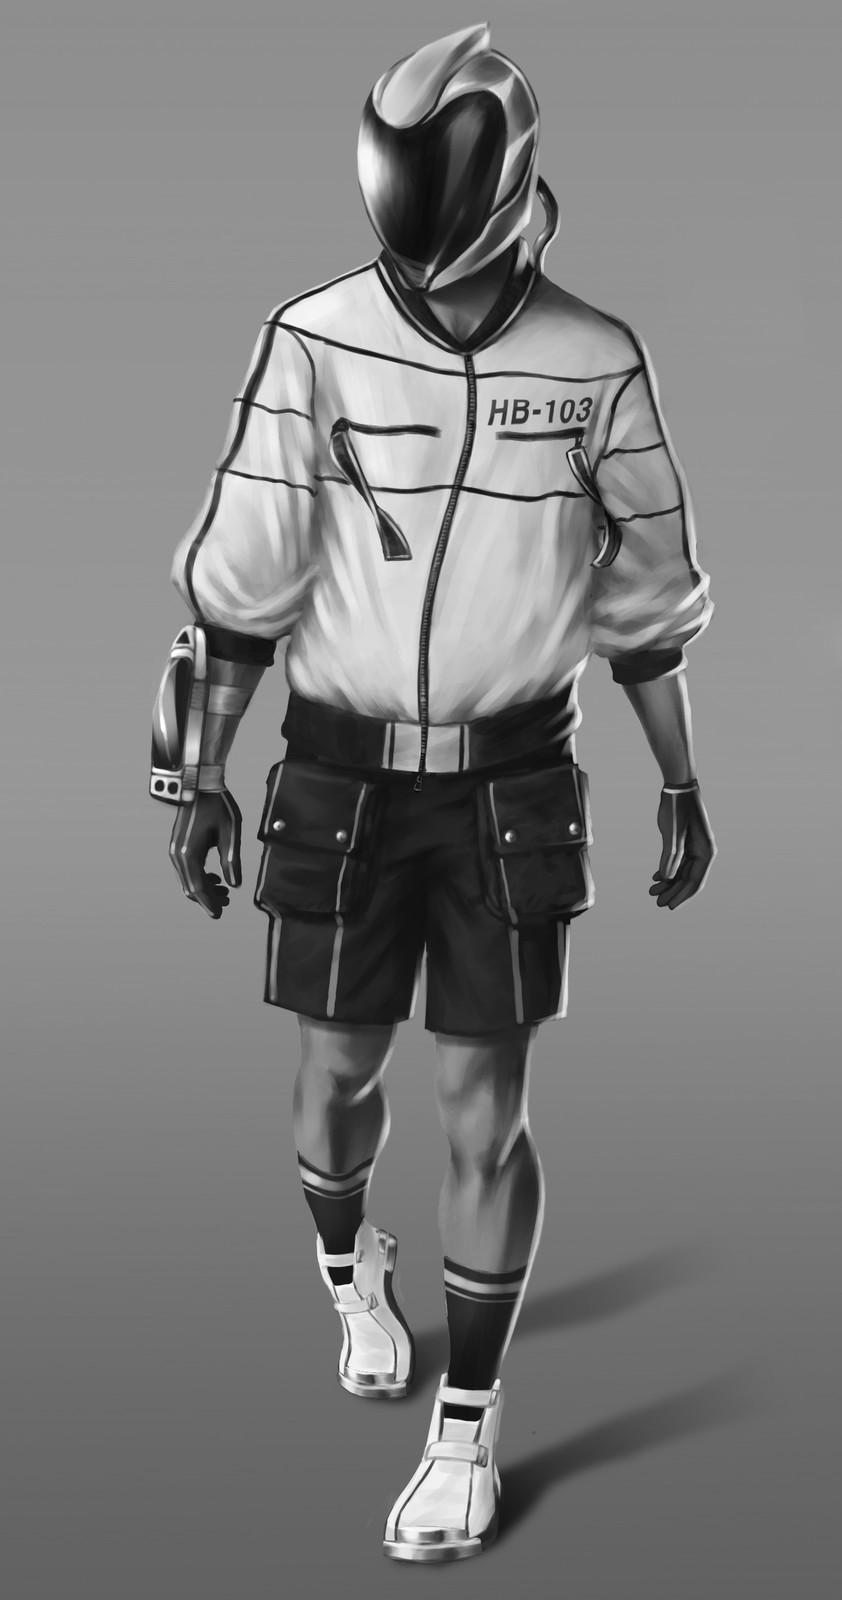 Hoverboarder character design